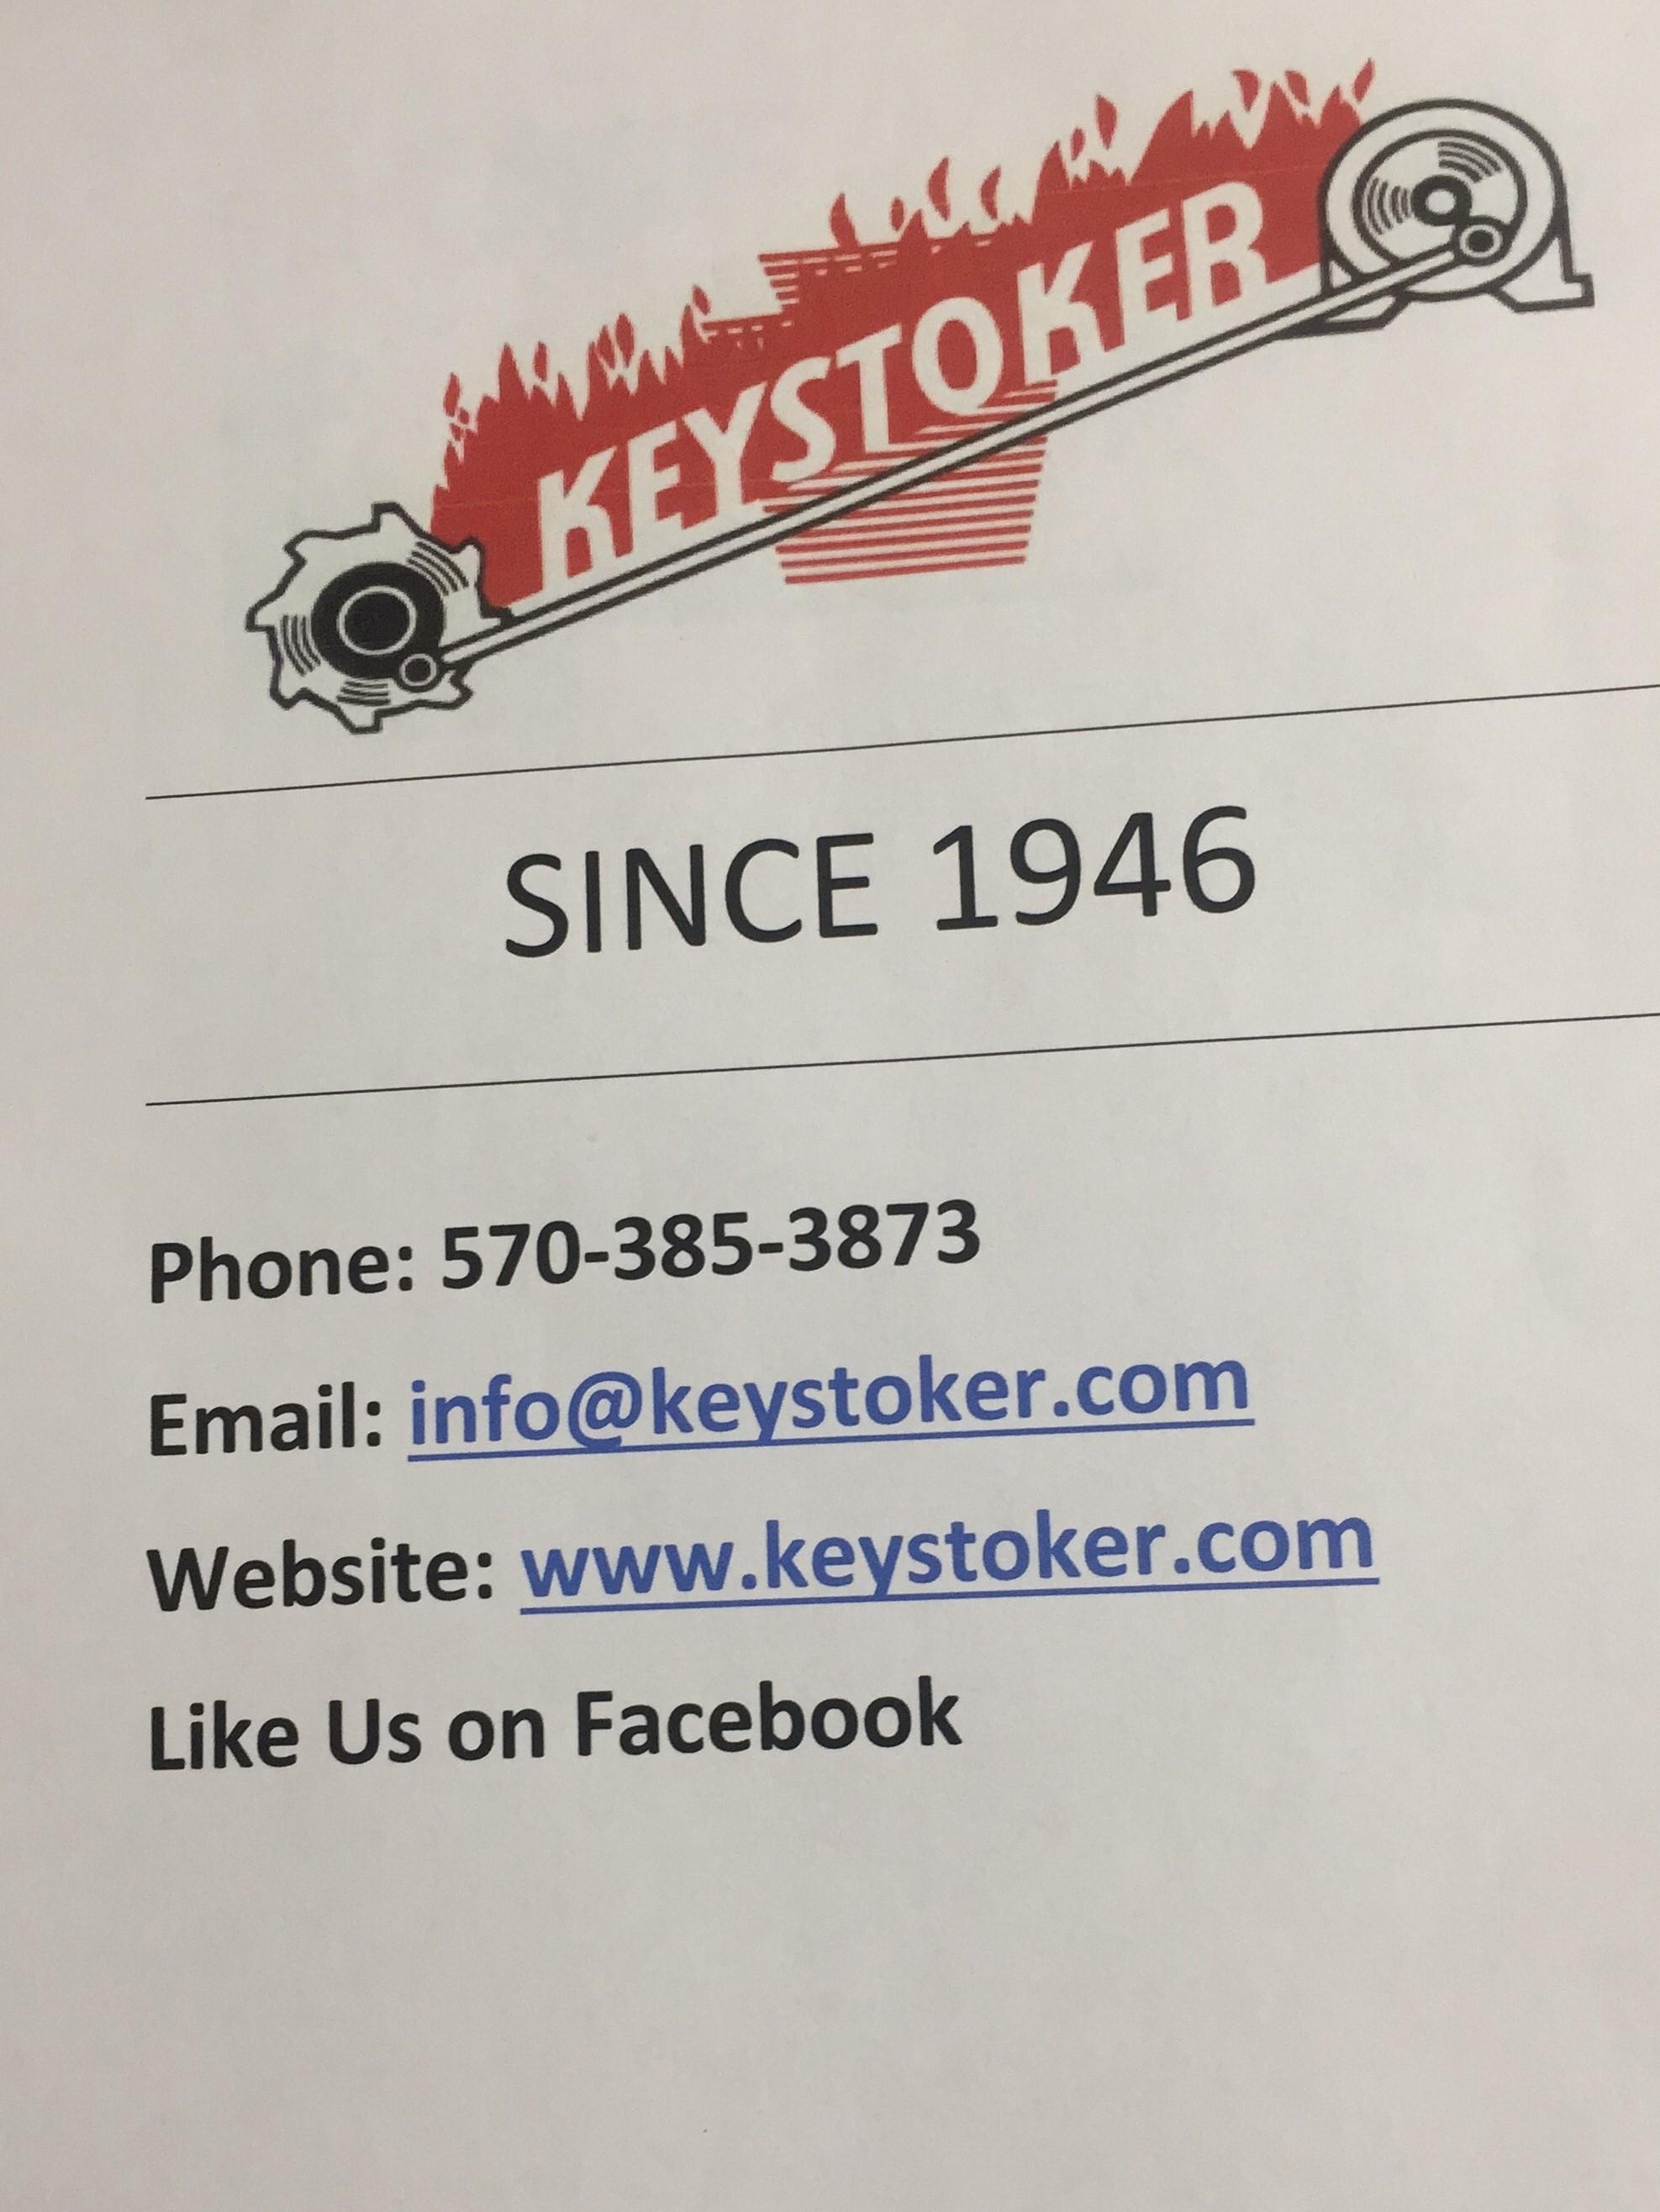 keystoker info.jpg